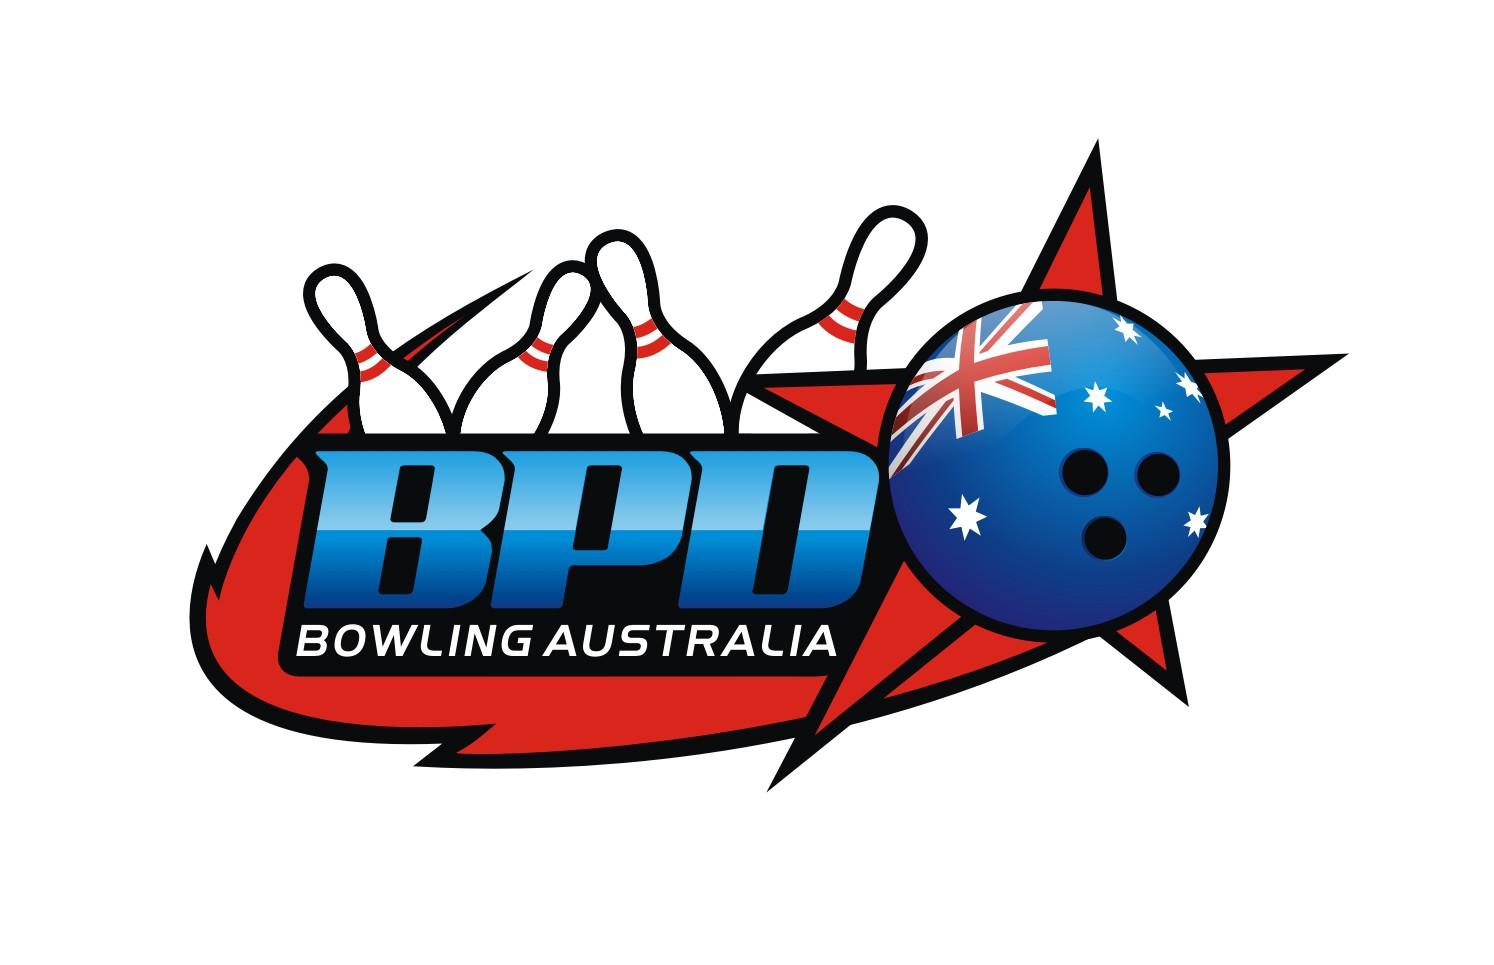 Help BPD Bowling Australia with a new logo